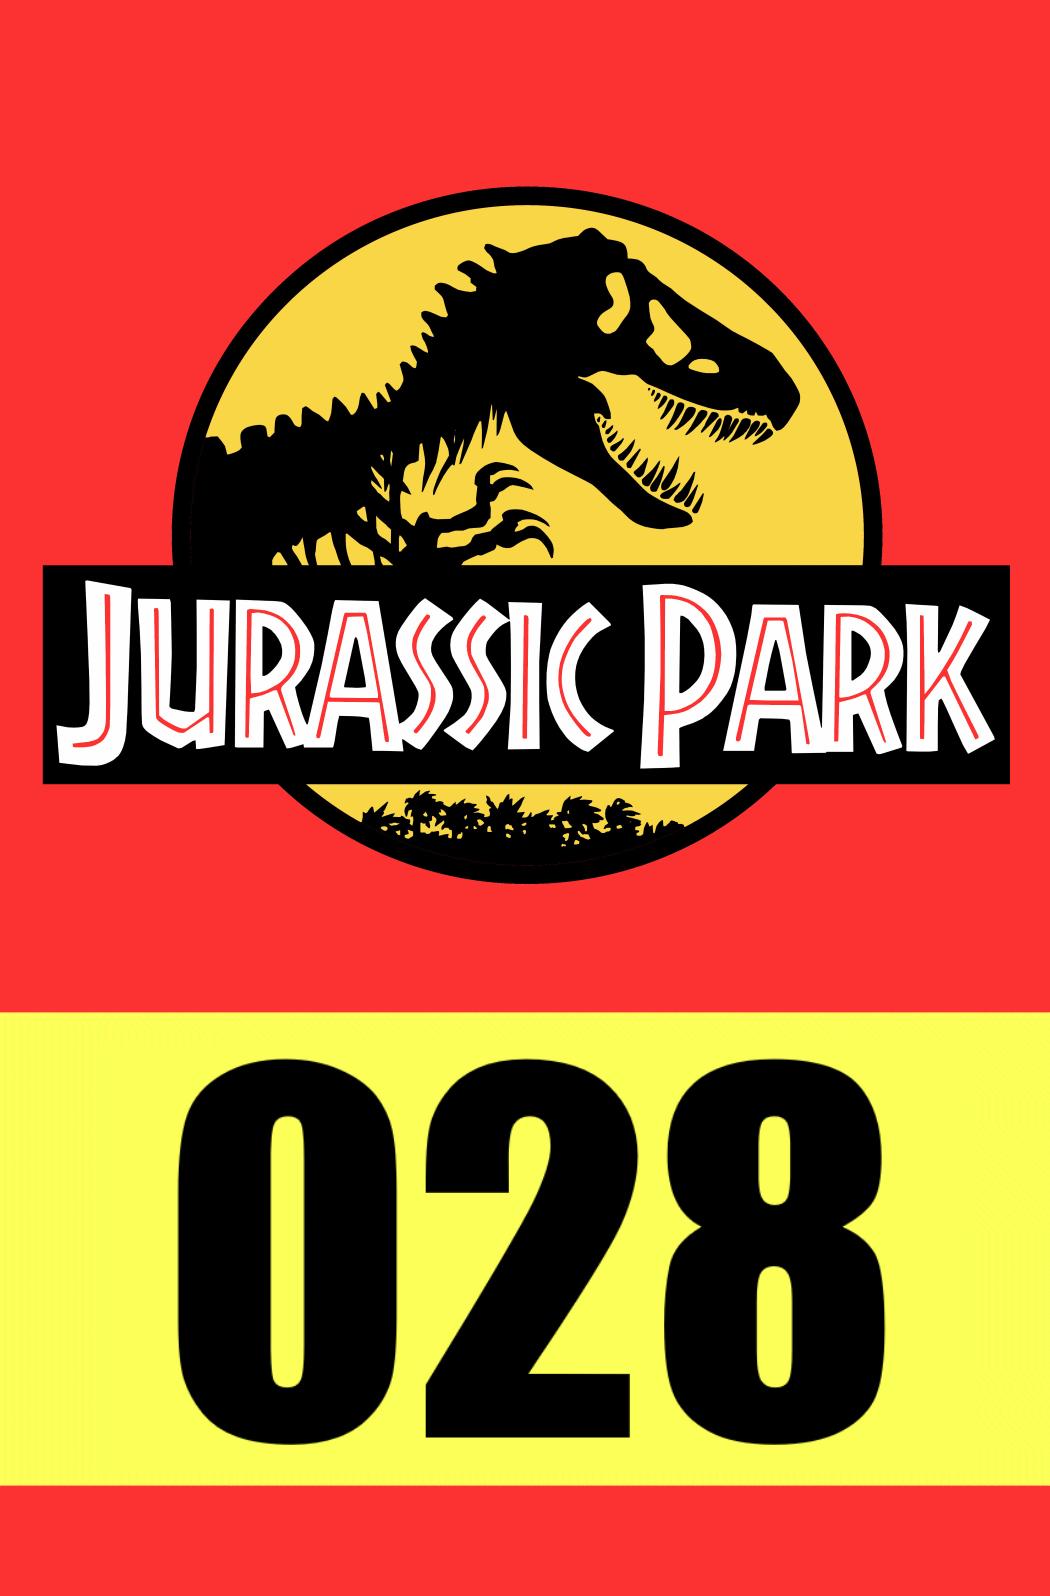 c074763431 jurassic park, car badge police: Impact | jurassic park in 2019 ...